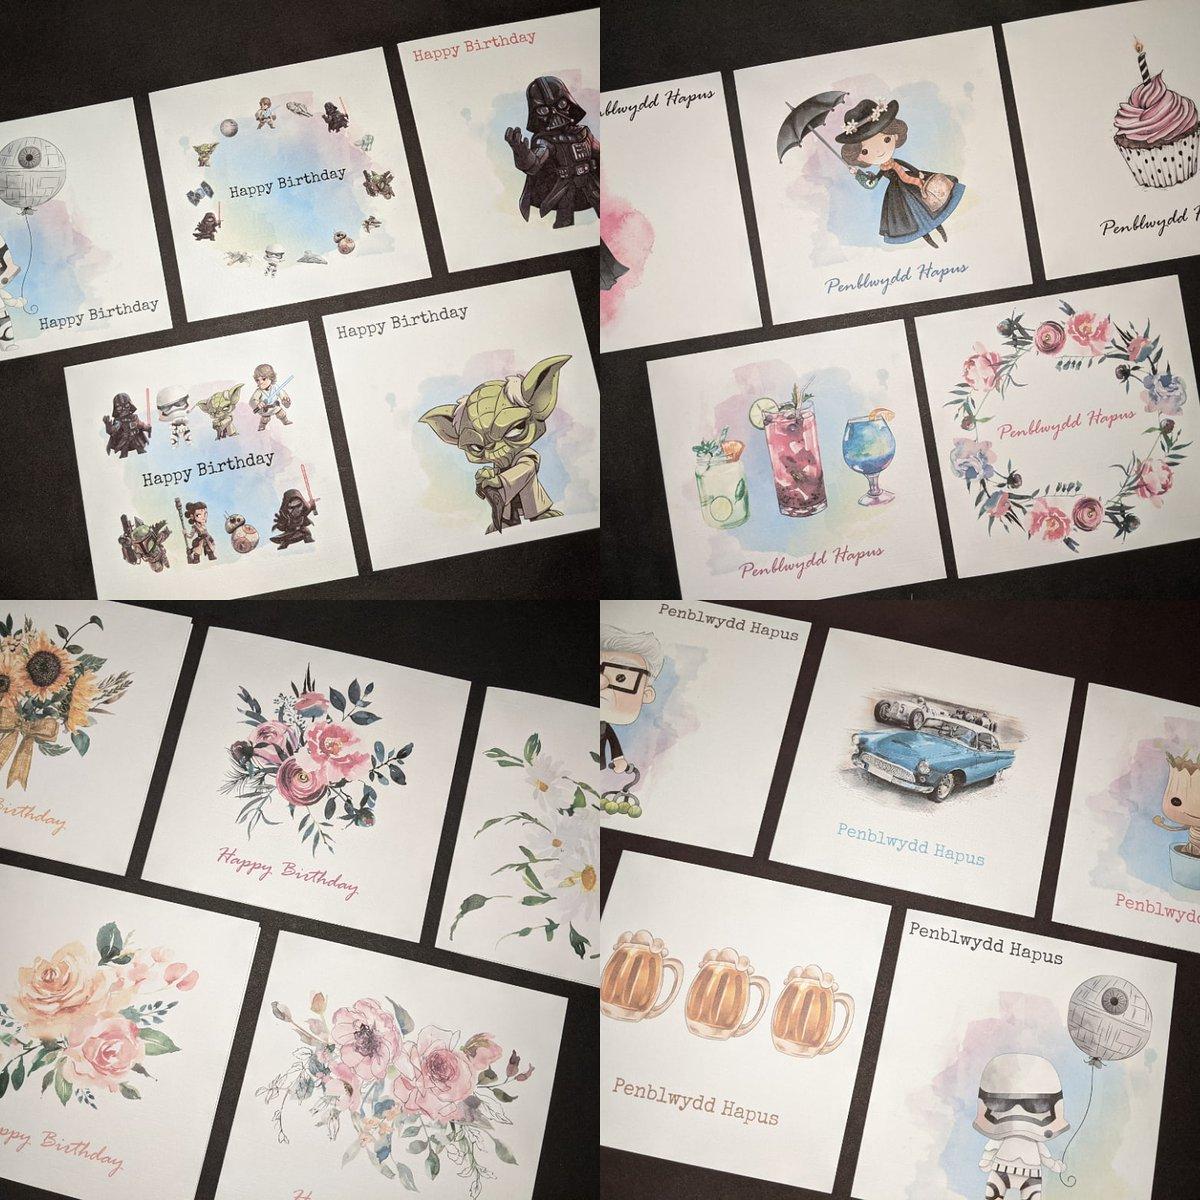 Always have a card on hand for those last minute birthdays ♥️♥️♥️ #greetingscards #HandmadeInUK #StayConnected #birthday #sharethelove #shopsmalluk #etsy #ebay https://t.co/1JgS7y6N2m